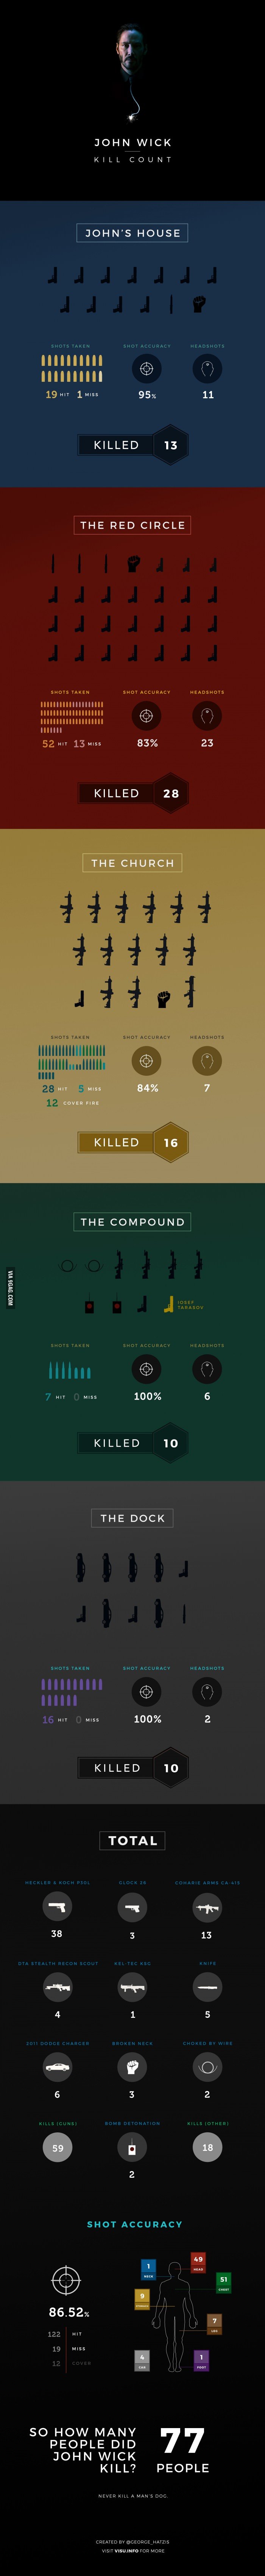 john-wick-infographic.jpg